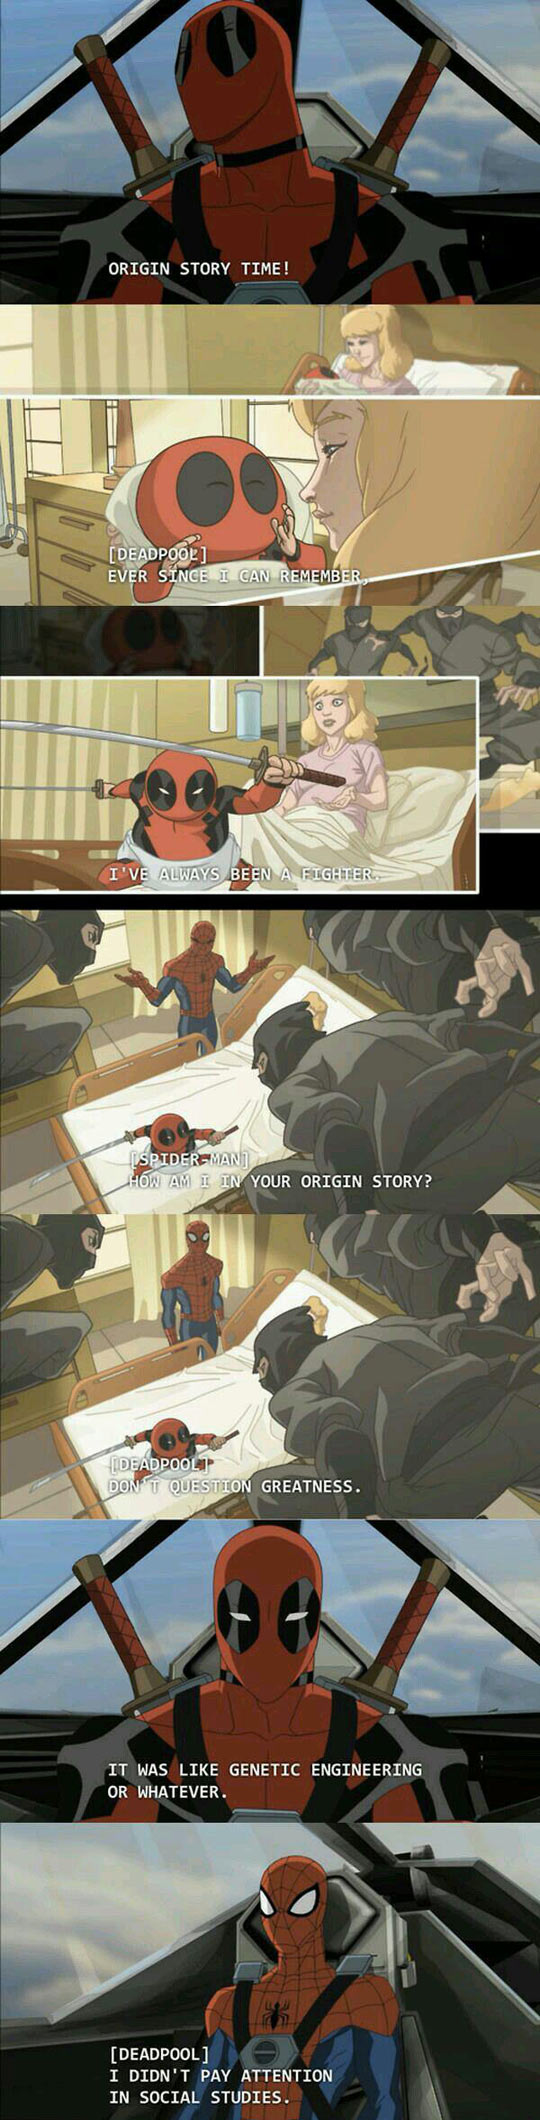 funny-Deadpool-story-origin-Spiderman